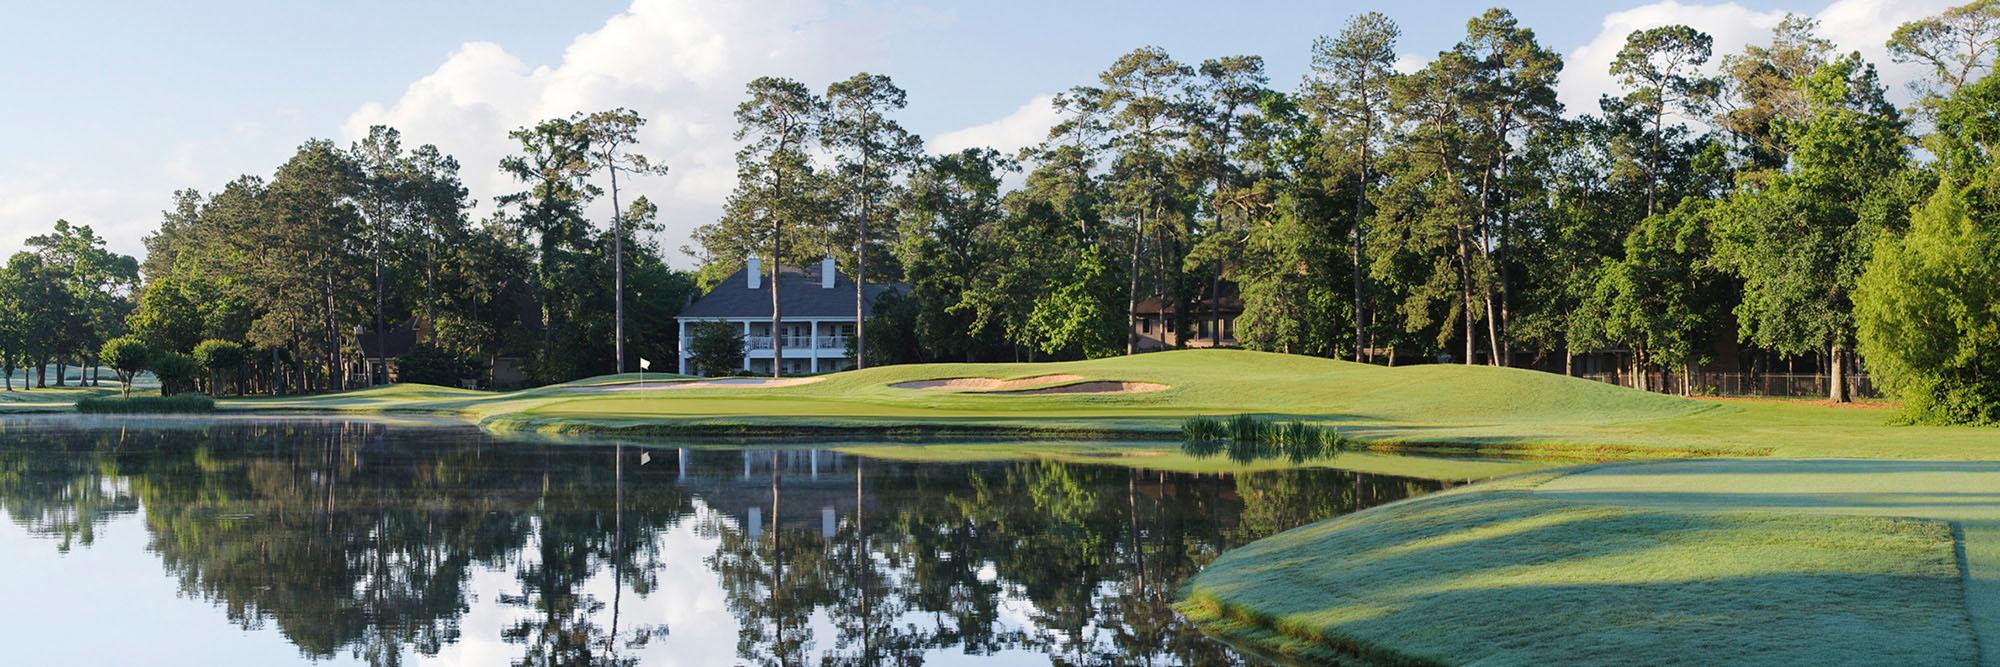 Golf Course Image - Woodlands-Tournament Course No. 3